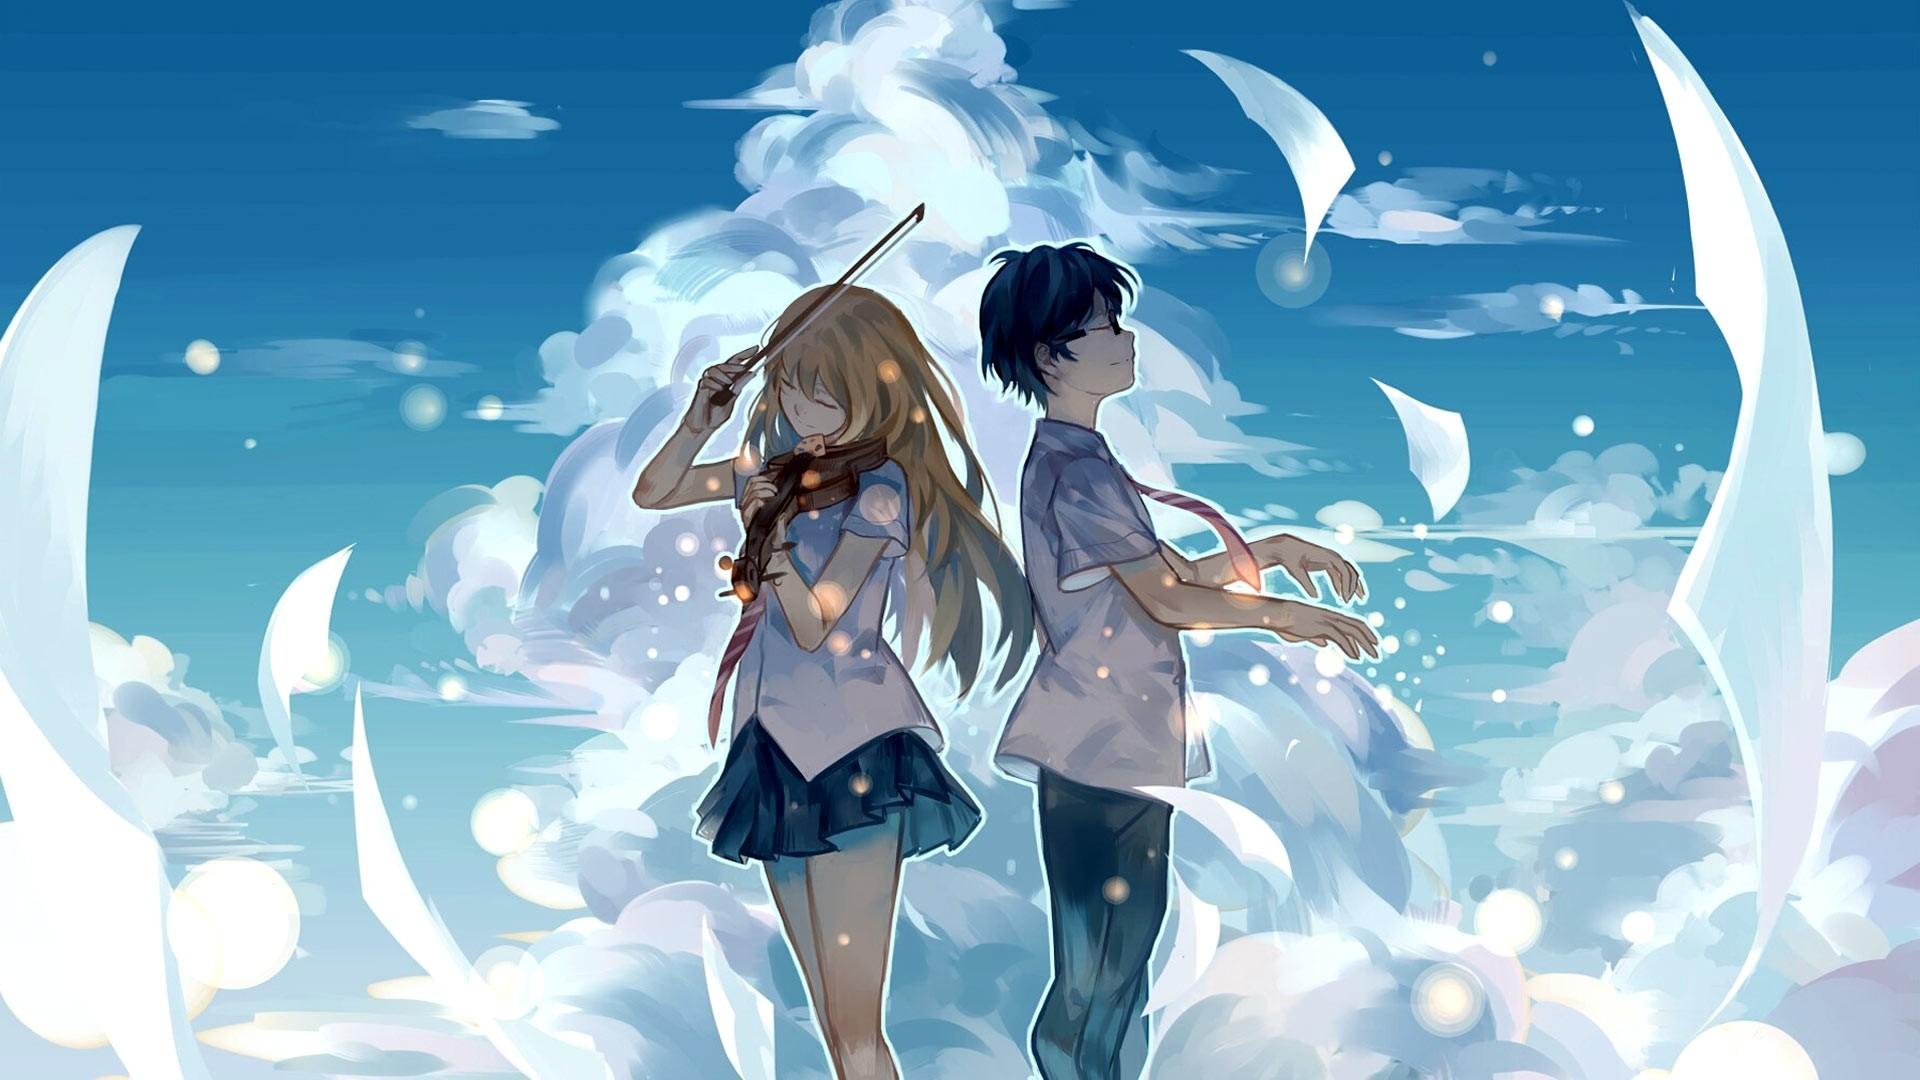 Unduh 9000 Wallpaper Anime 4k Hd HD Gratis